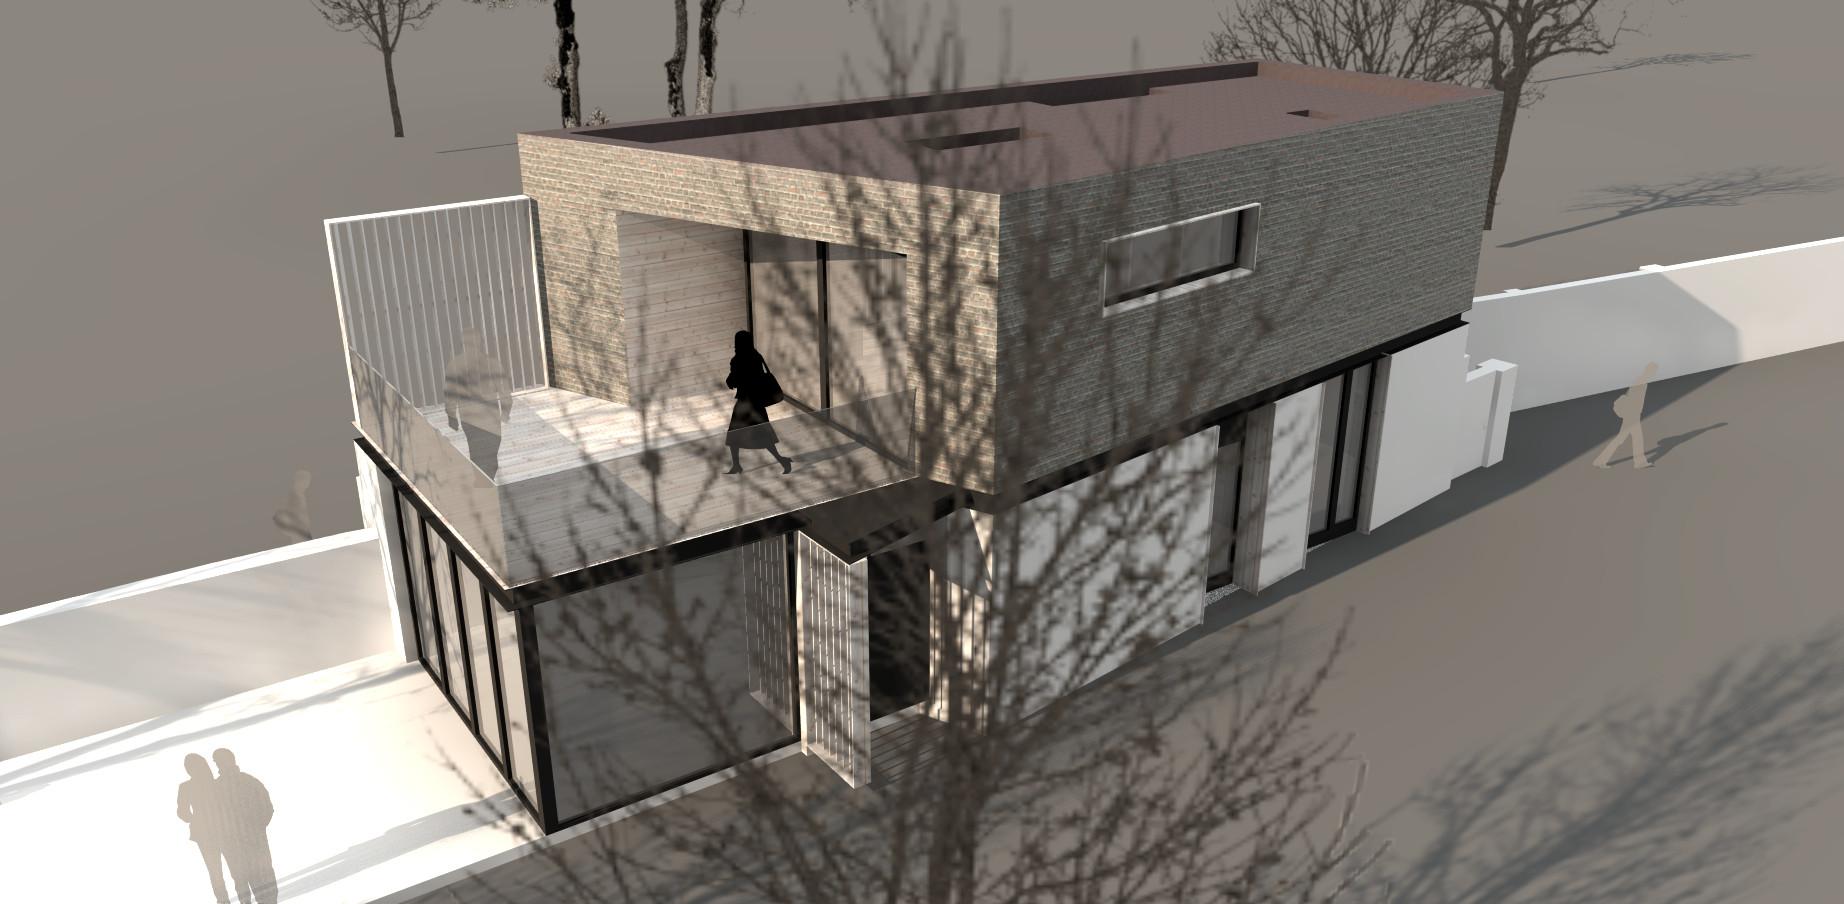 House Extention_Refurb_Clontarf Road  view 8.jpg